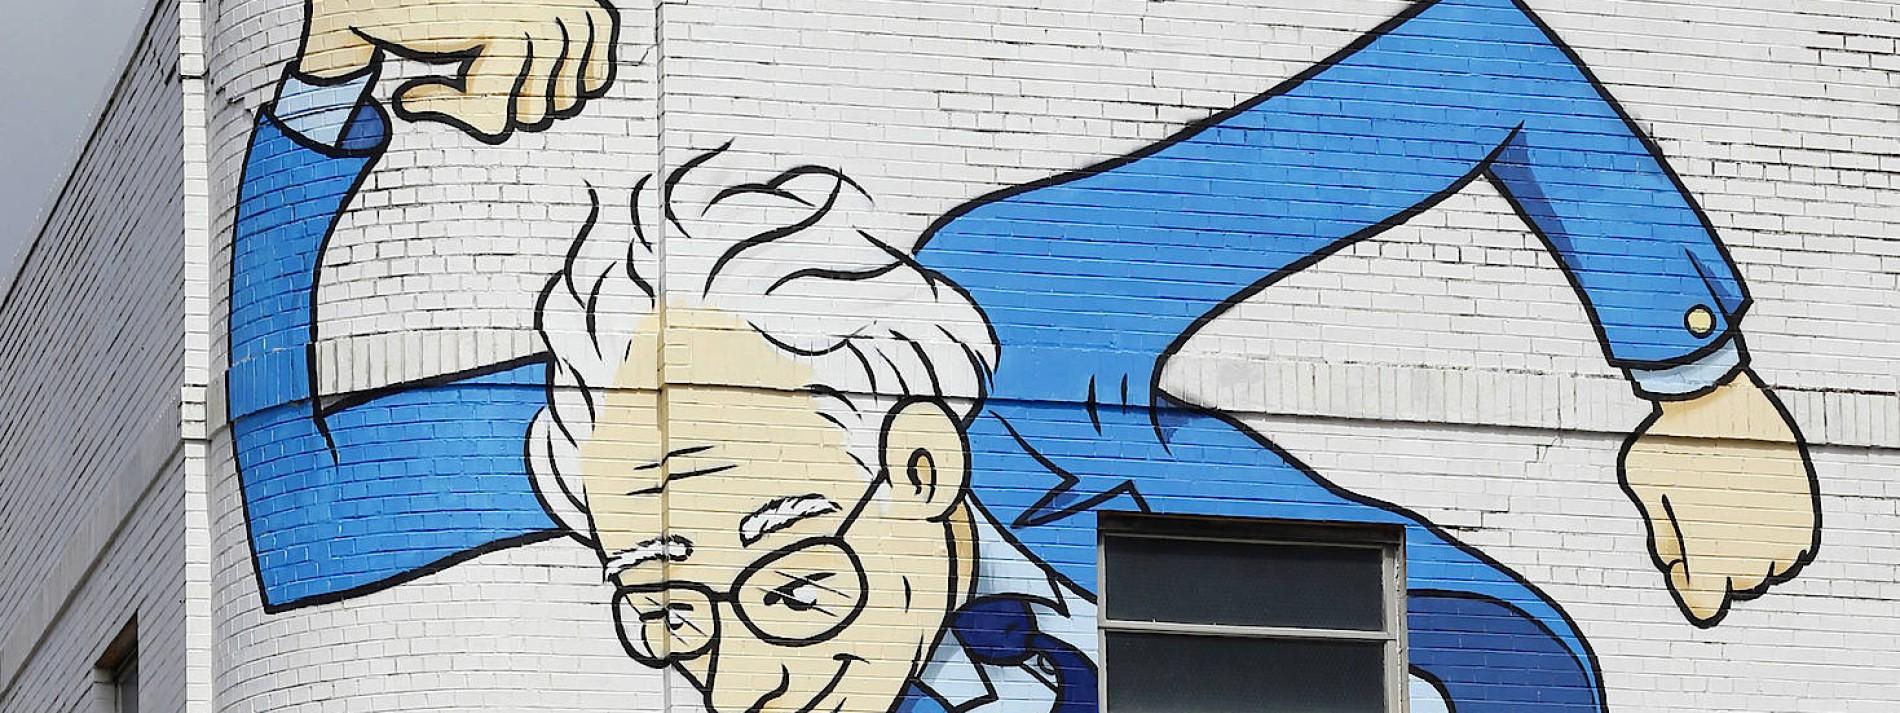 Art for Bernie